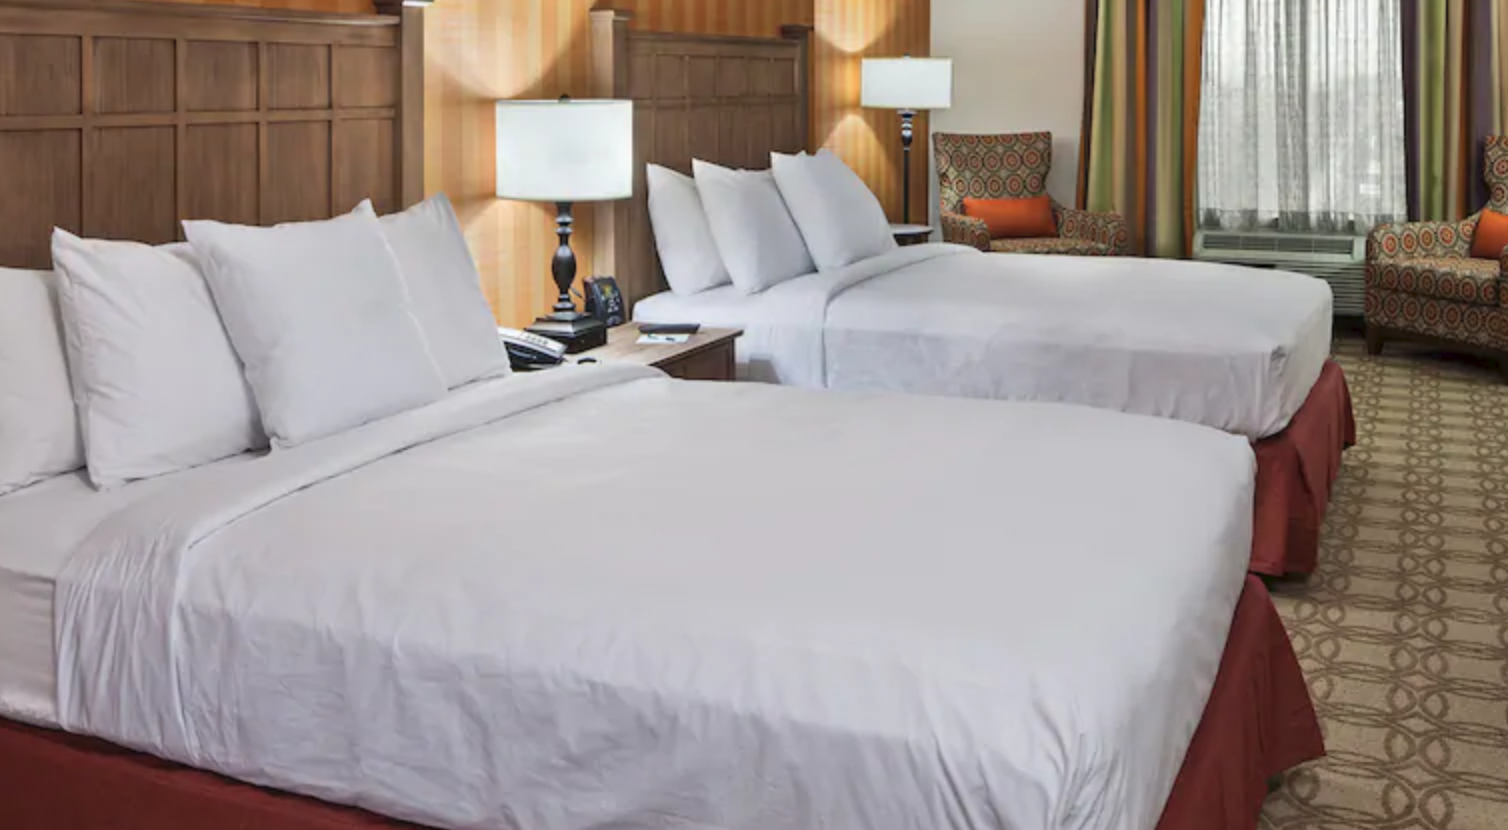 https://www.hotelsbyday.com/_data/default-hotel_image/4/20517/screenshot-2020-08-13-at-2-19-08-pm.png